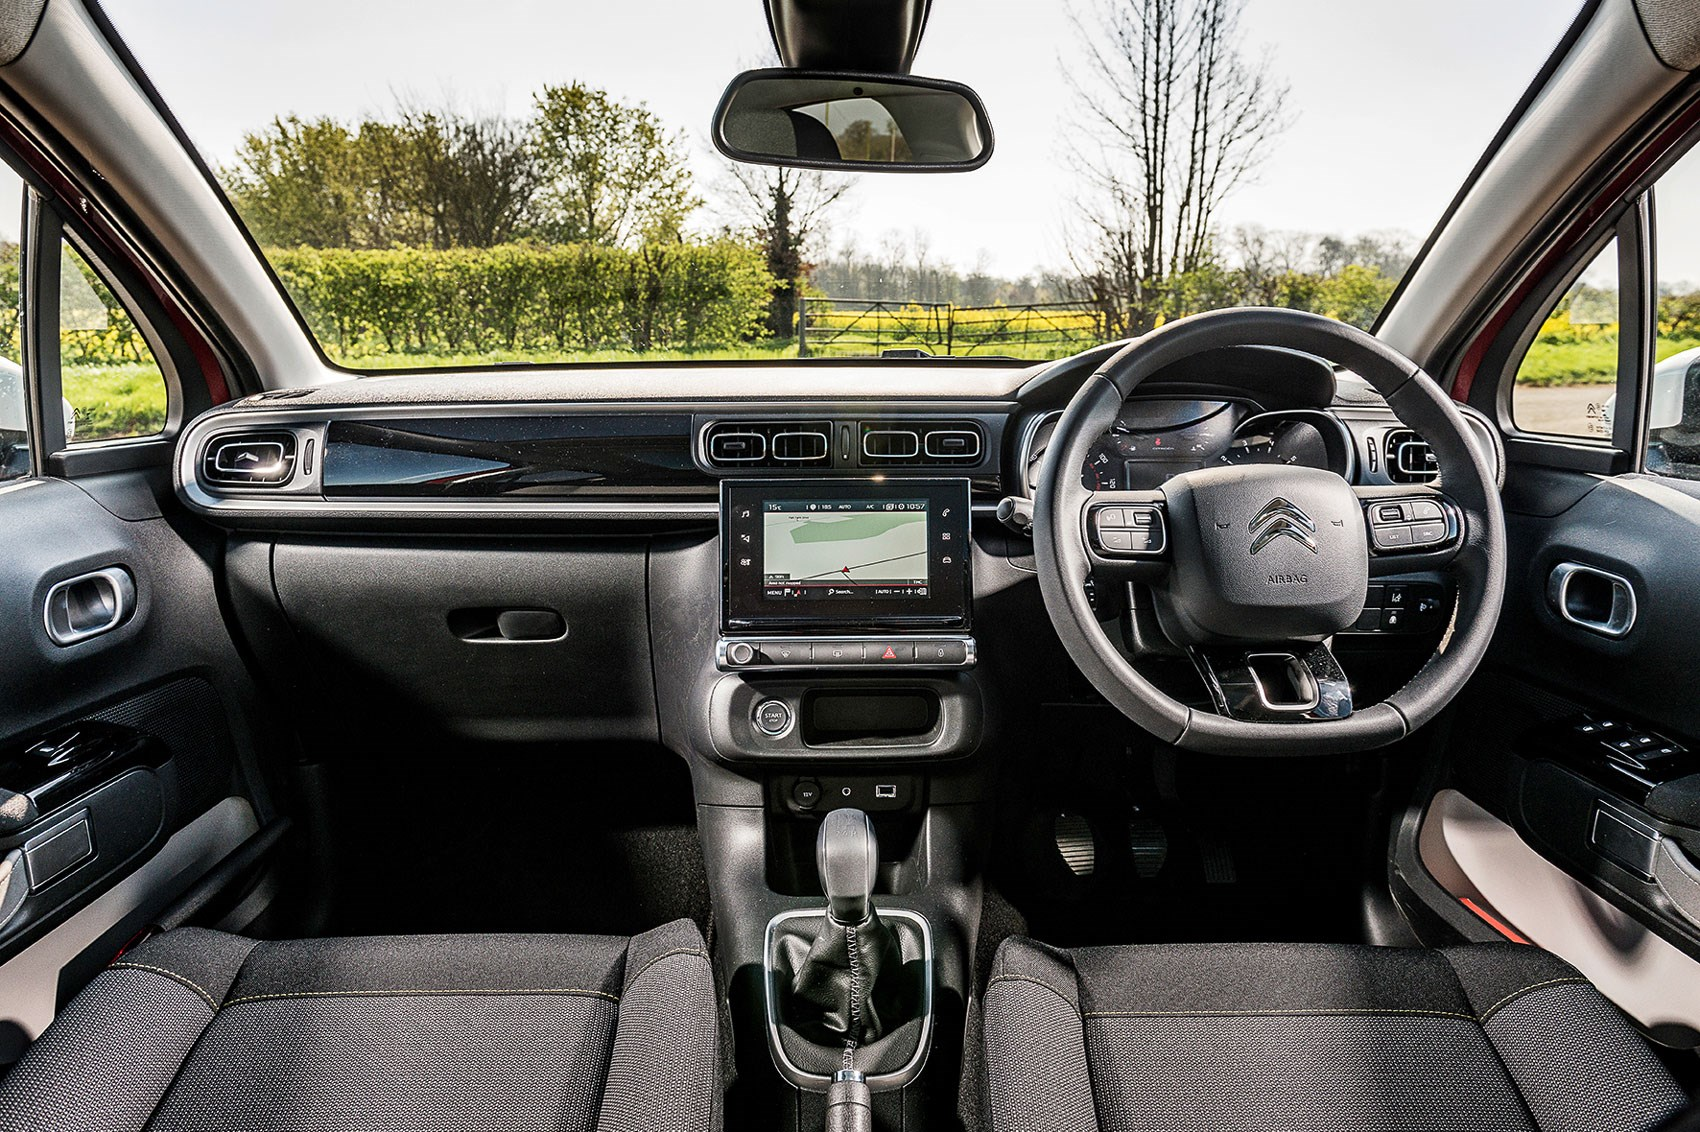 Citroen C3 Flair (2017) long-term test review | CAR Magazine